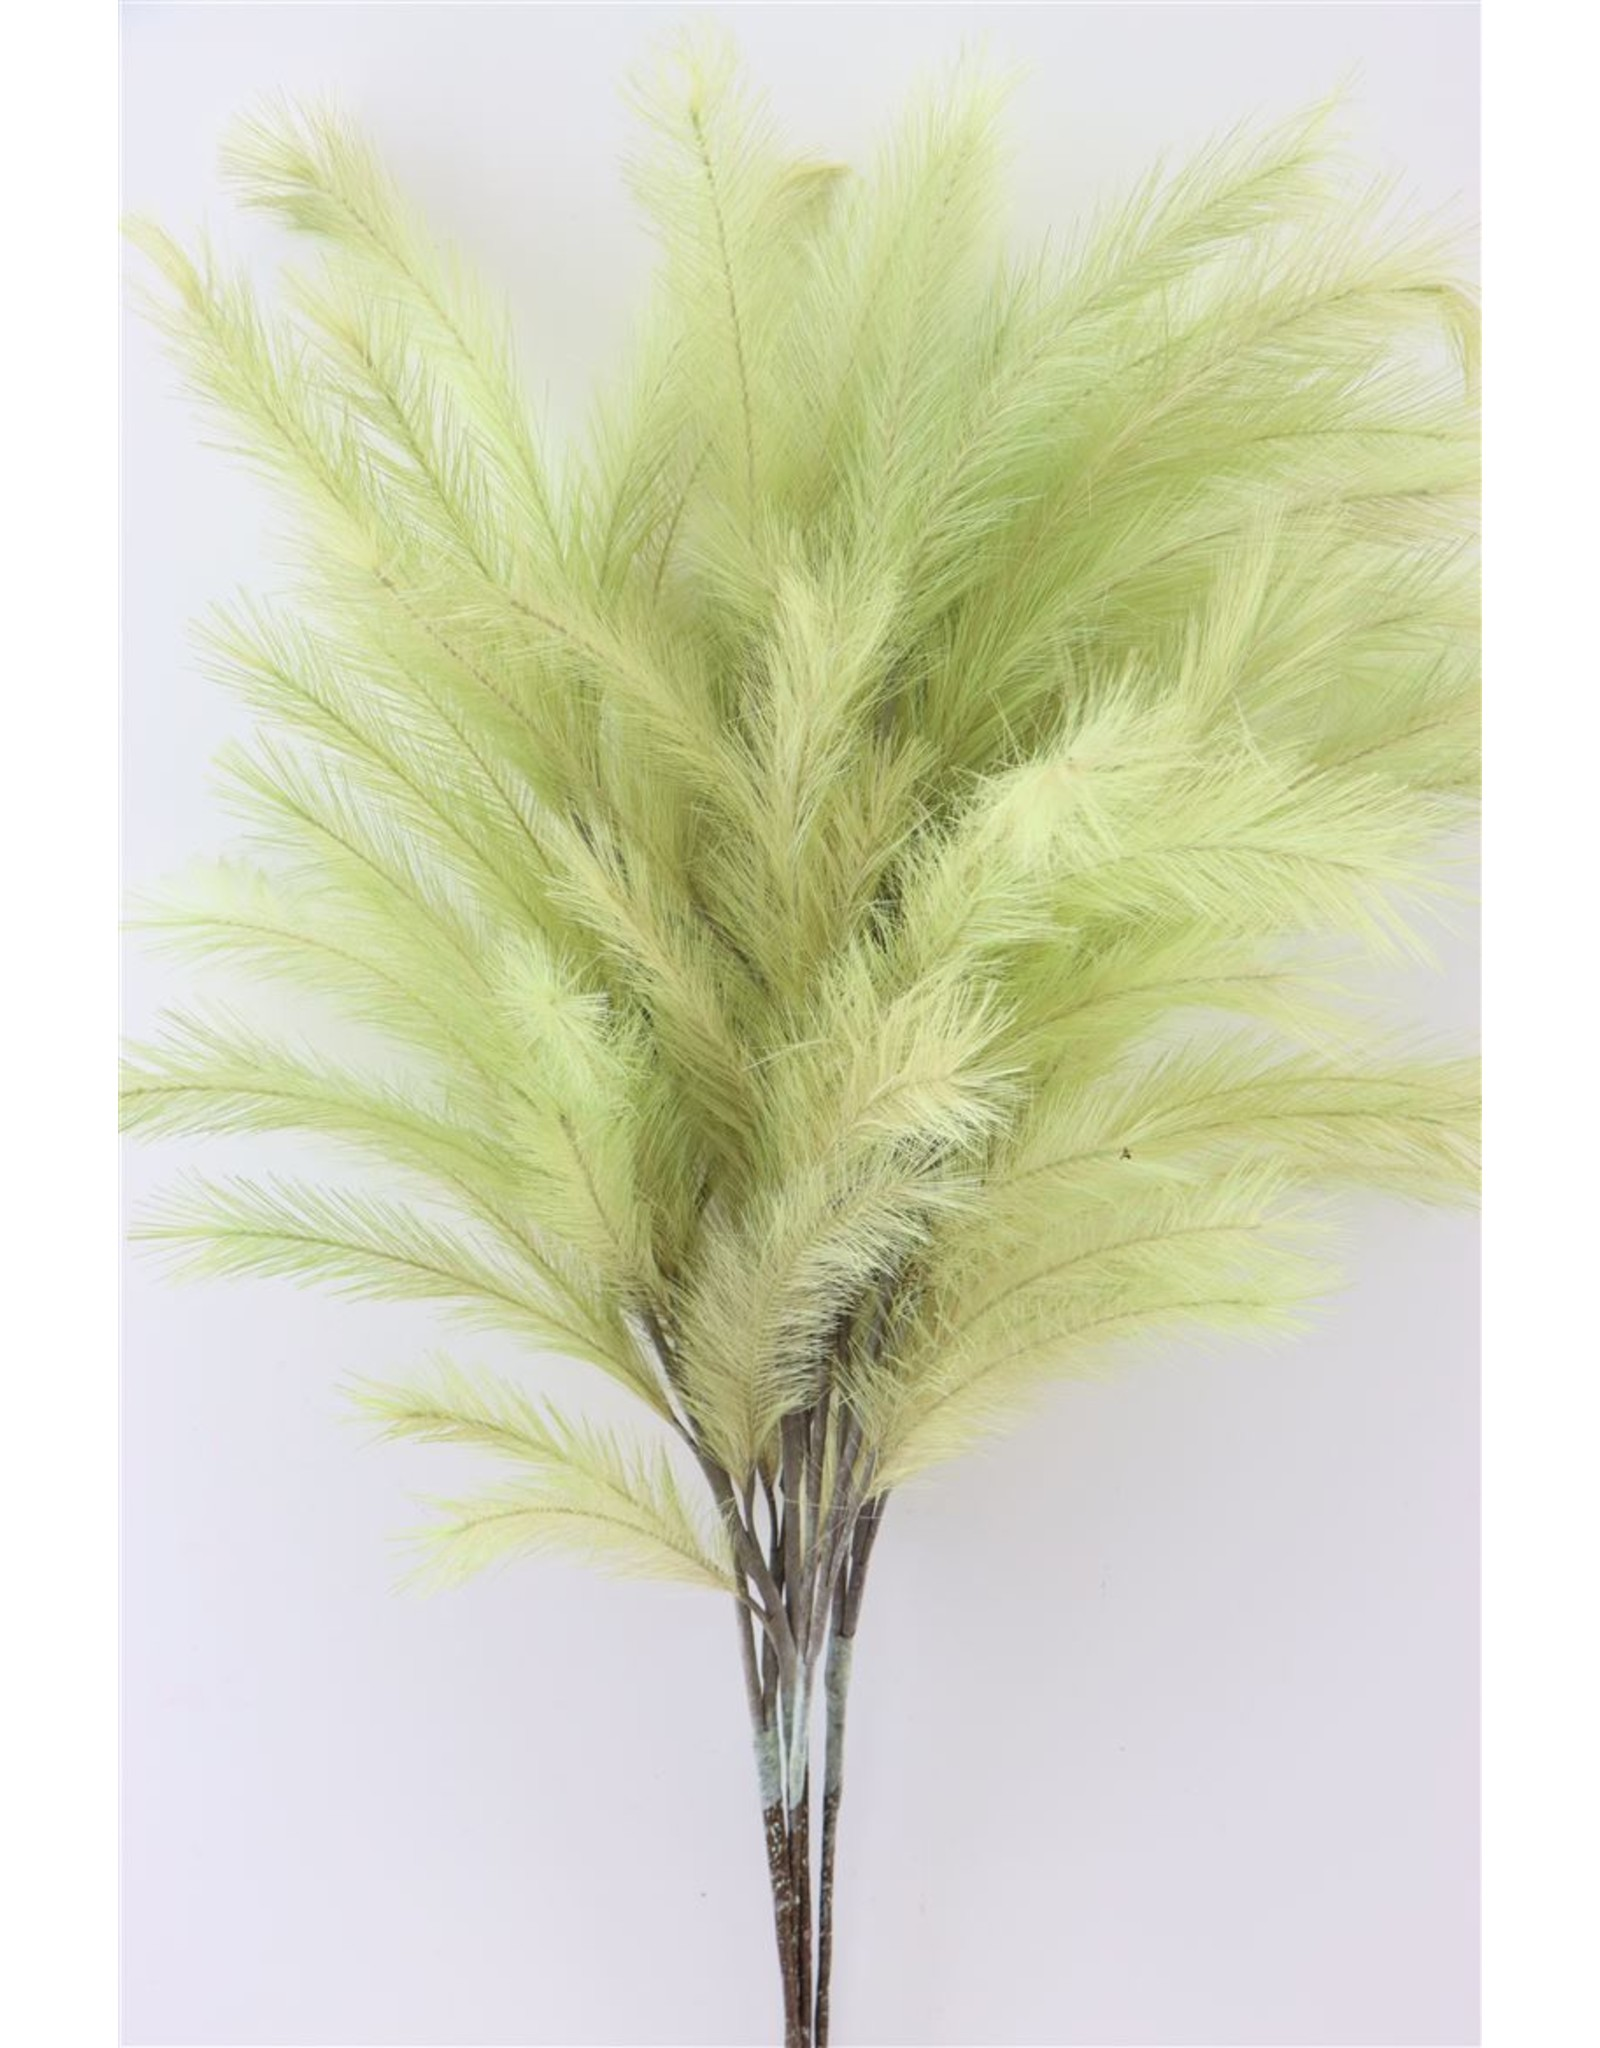 GF Deco Panicle Grass 100cm Mint Green P. Stem x 4